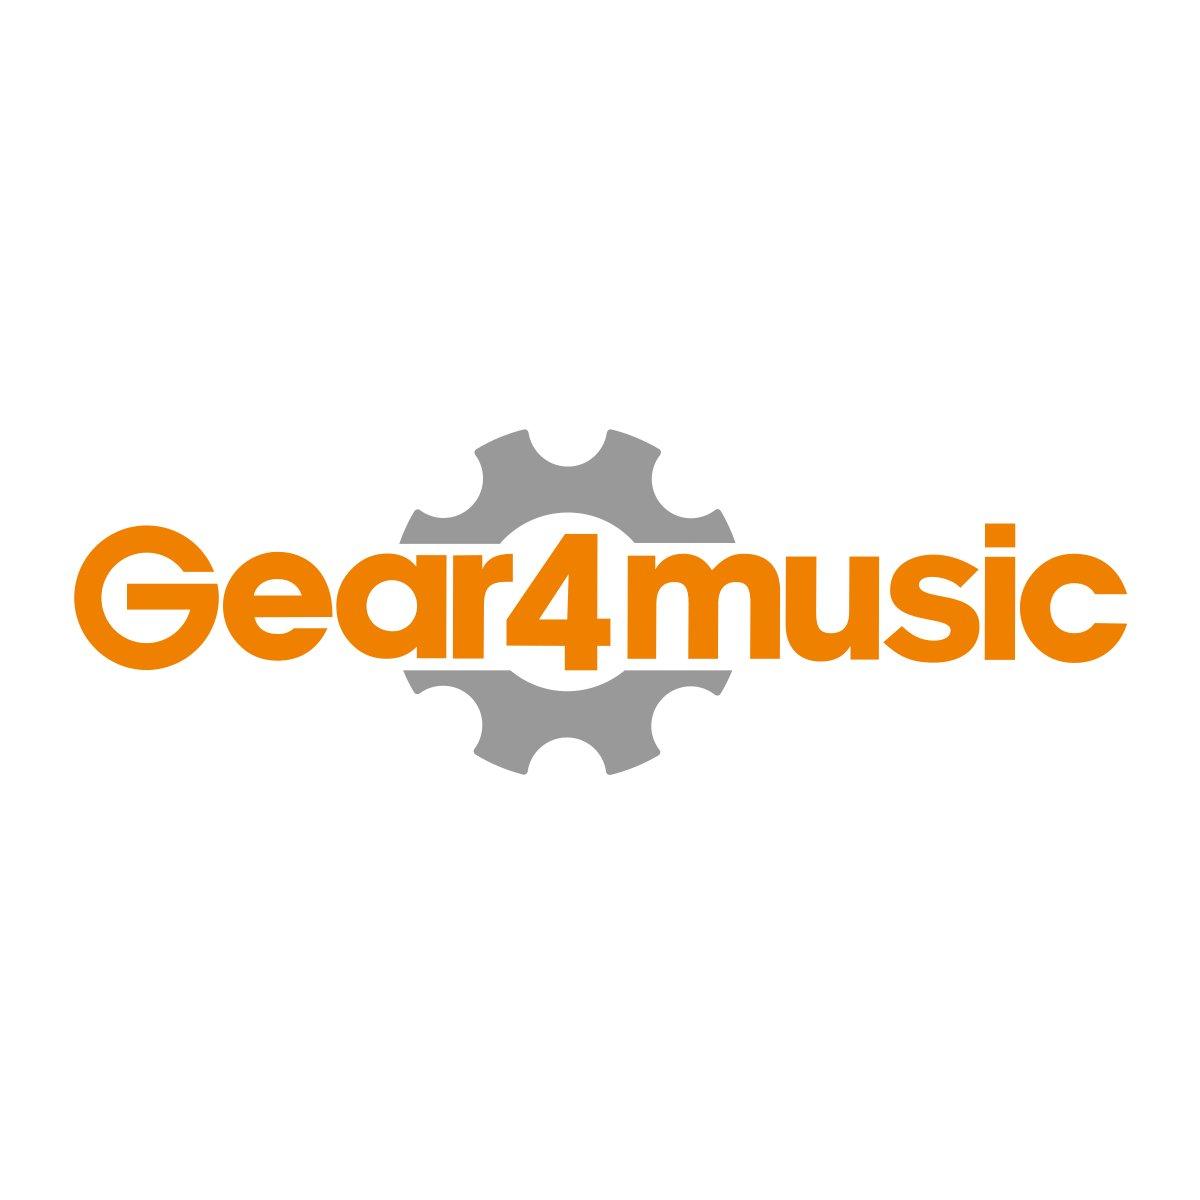 LA Electric Guitar by Gear4music, White